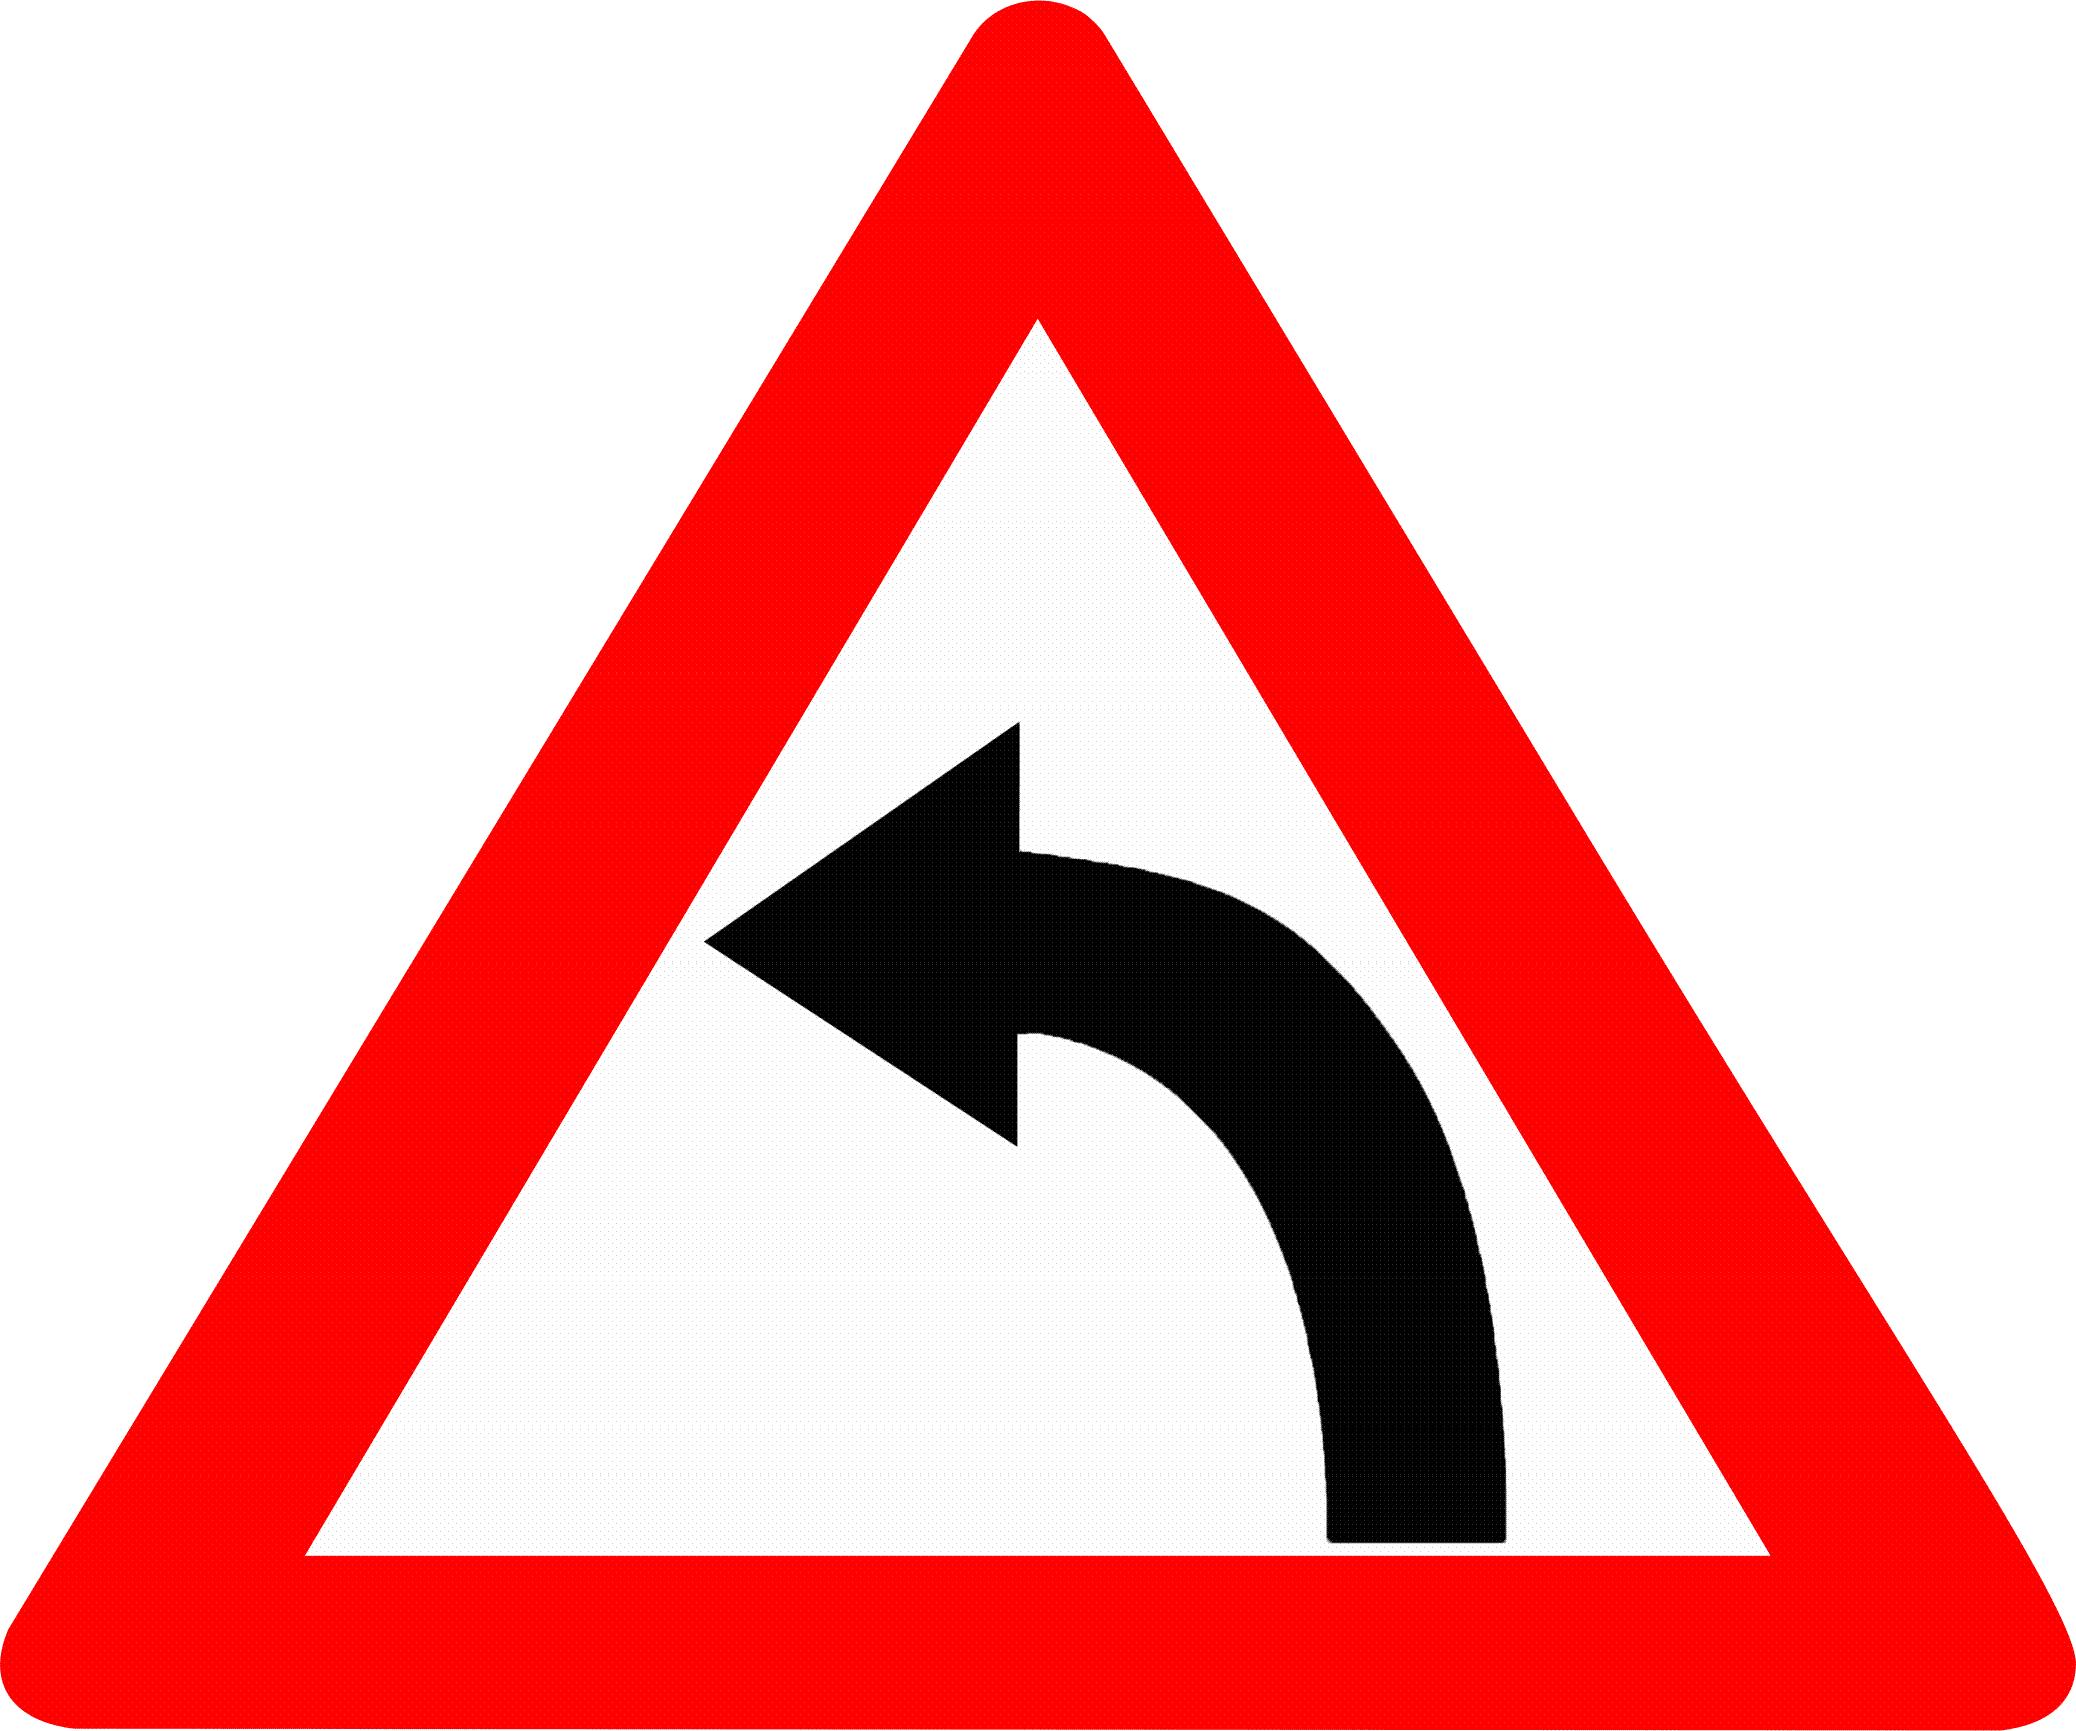 Left Hand Image File:left Hand Curve Sign